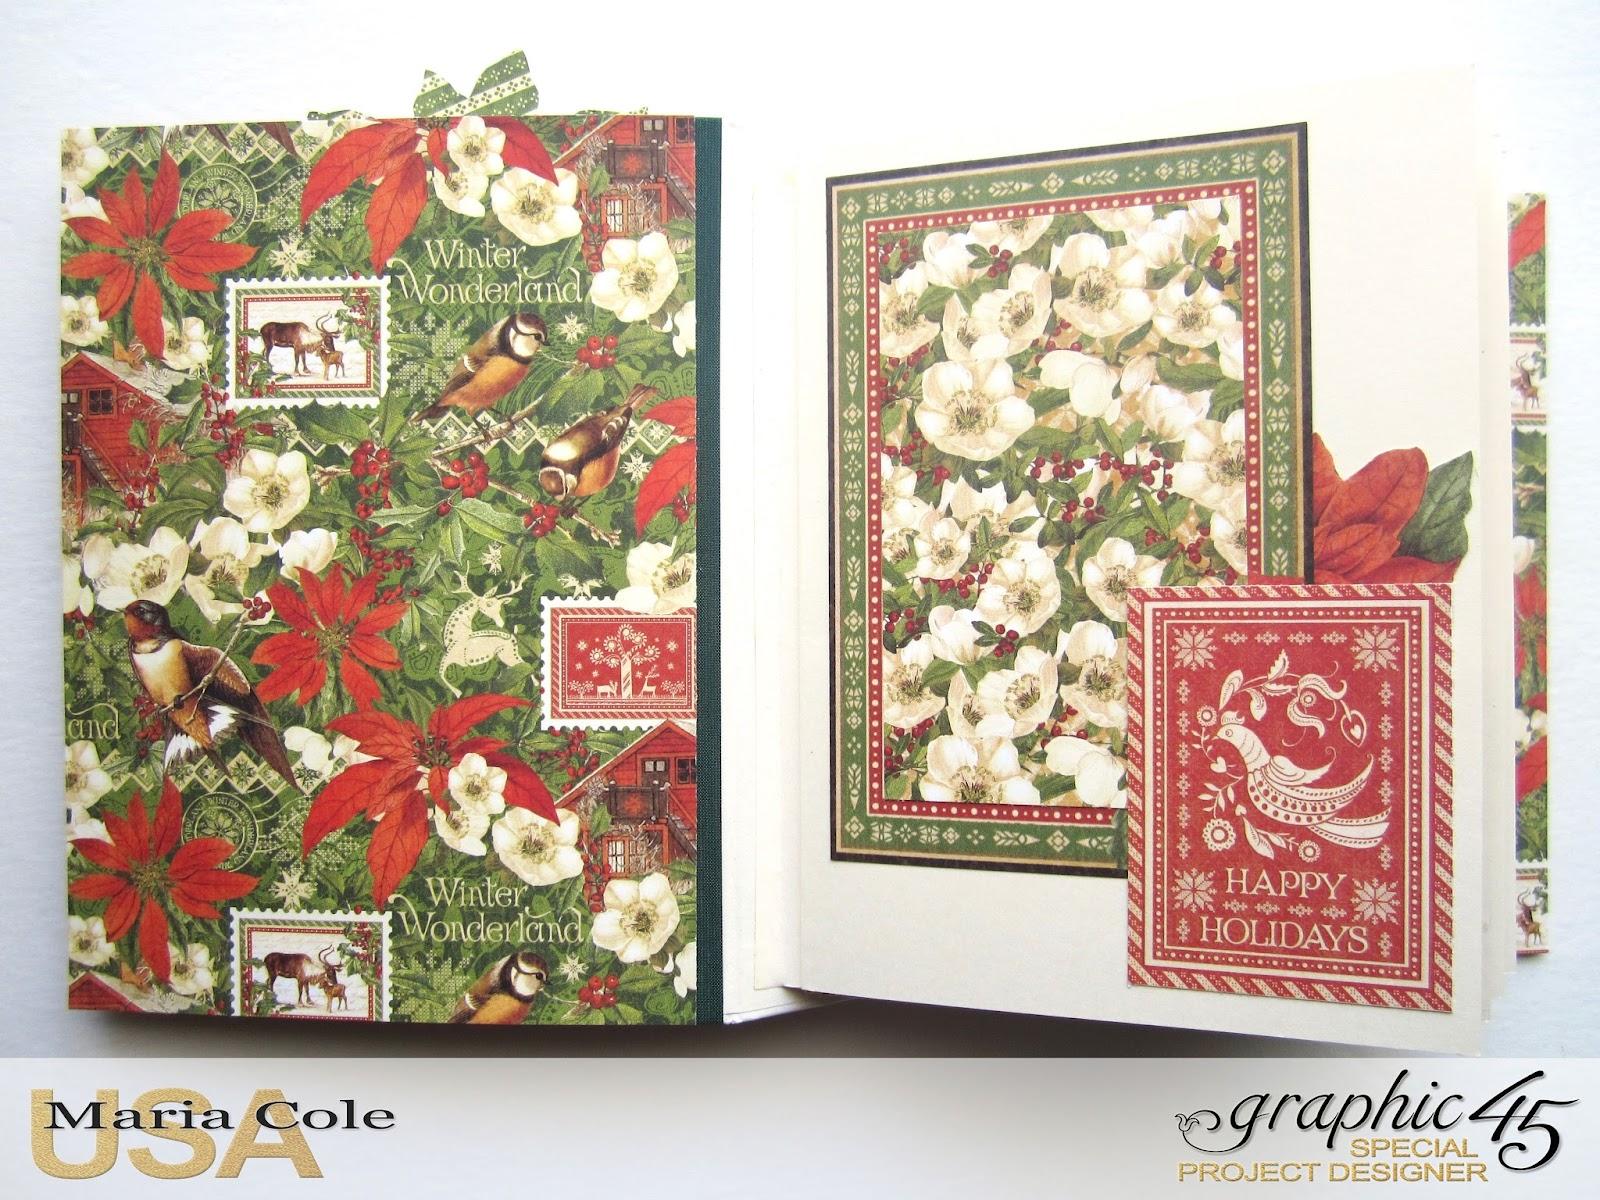 Graphic-45-Winter-Wonderland-Rectangle-Pocket-Album-Maria-Cole-06.jpg